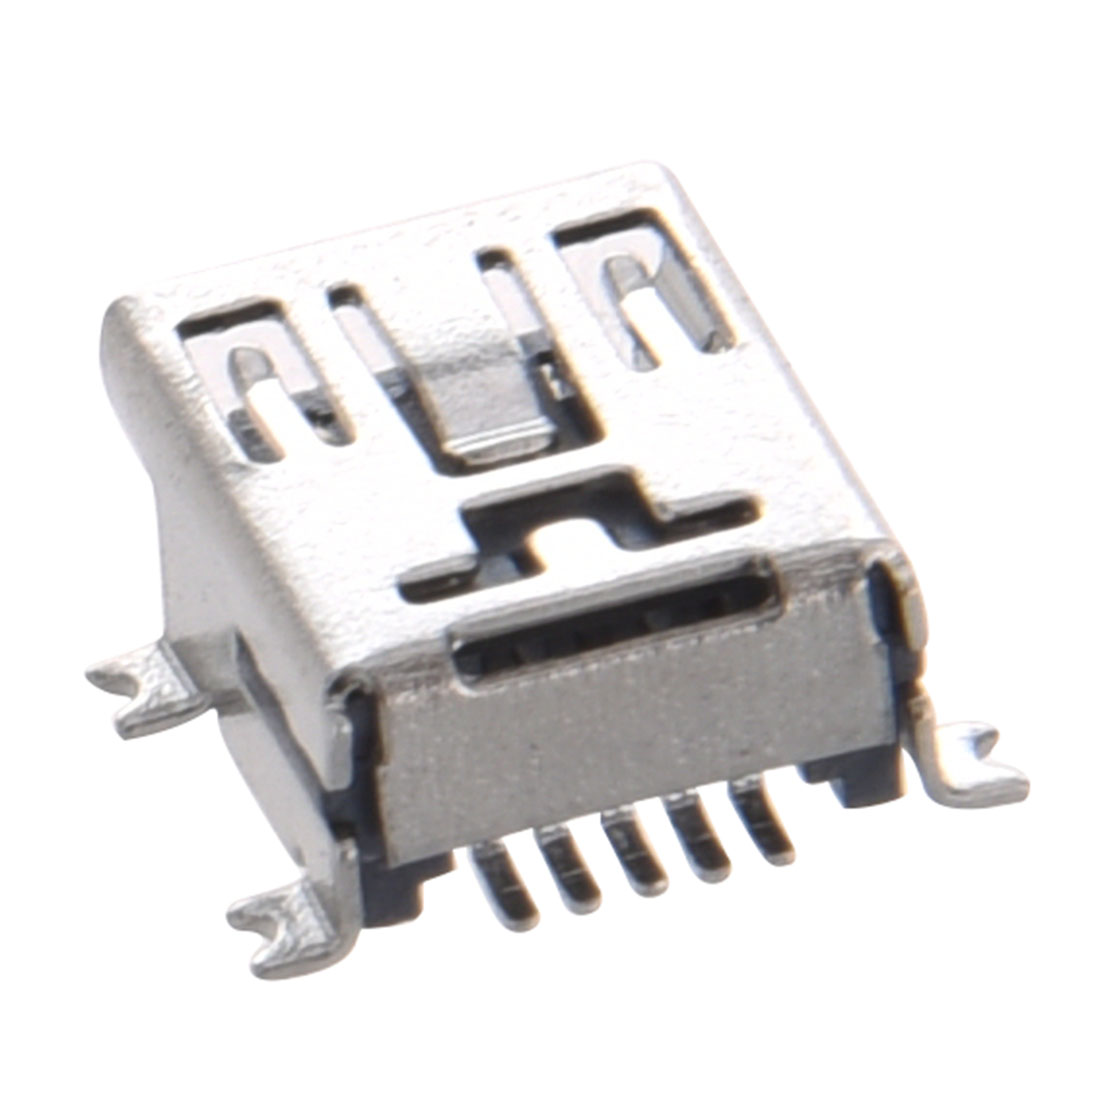 5 Pcs Mini USB Type B Female Port 5-Pin 180 Degree SMD SMT PCB Jack Socket 20 pcs mini usb type b female 5 pin smt smd pcb socket connector short body usb